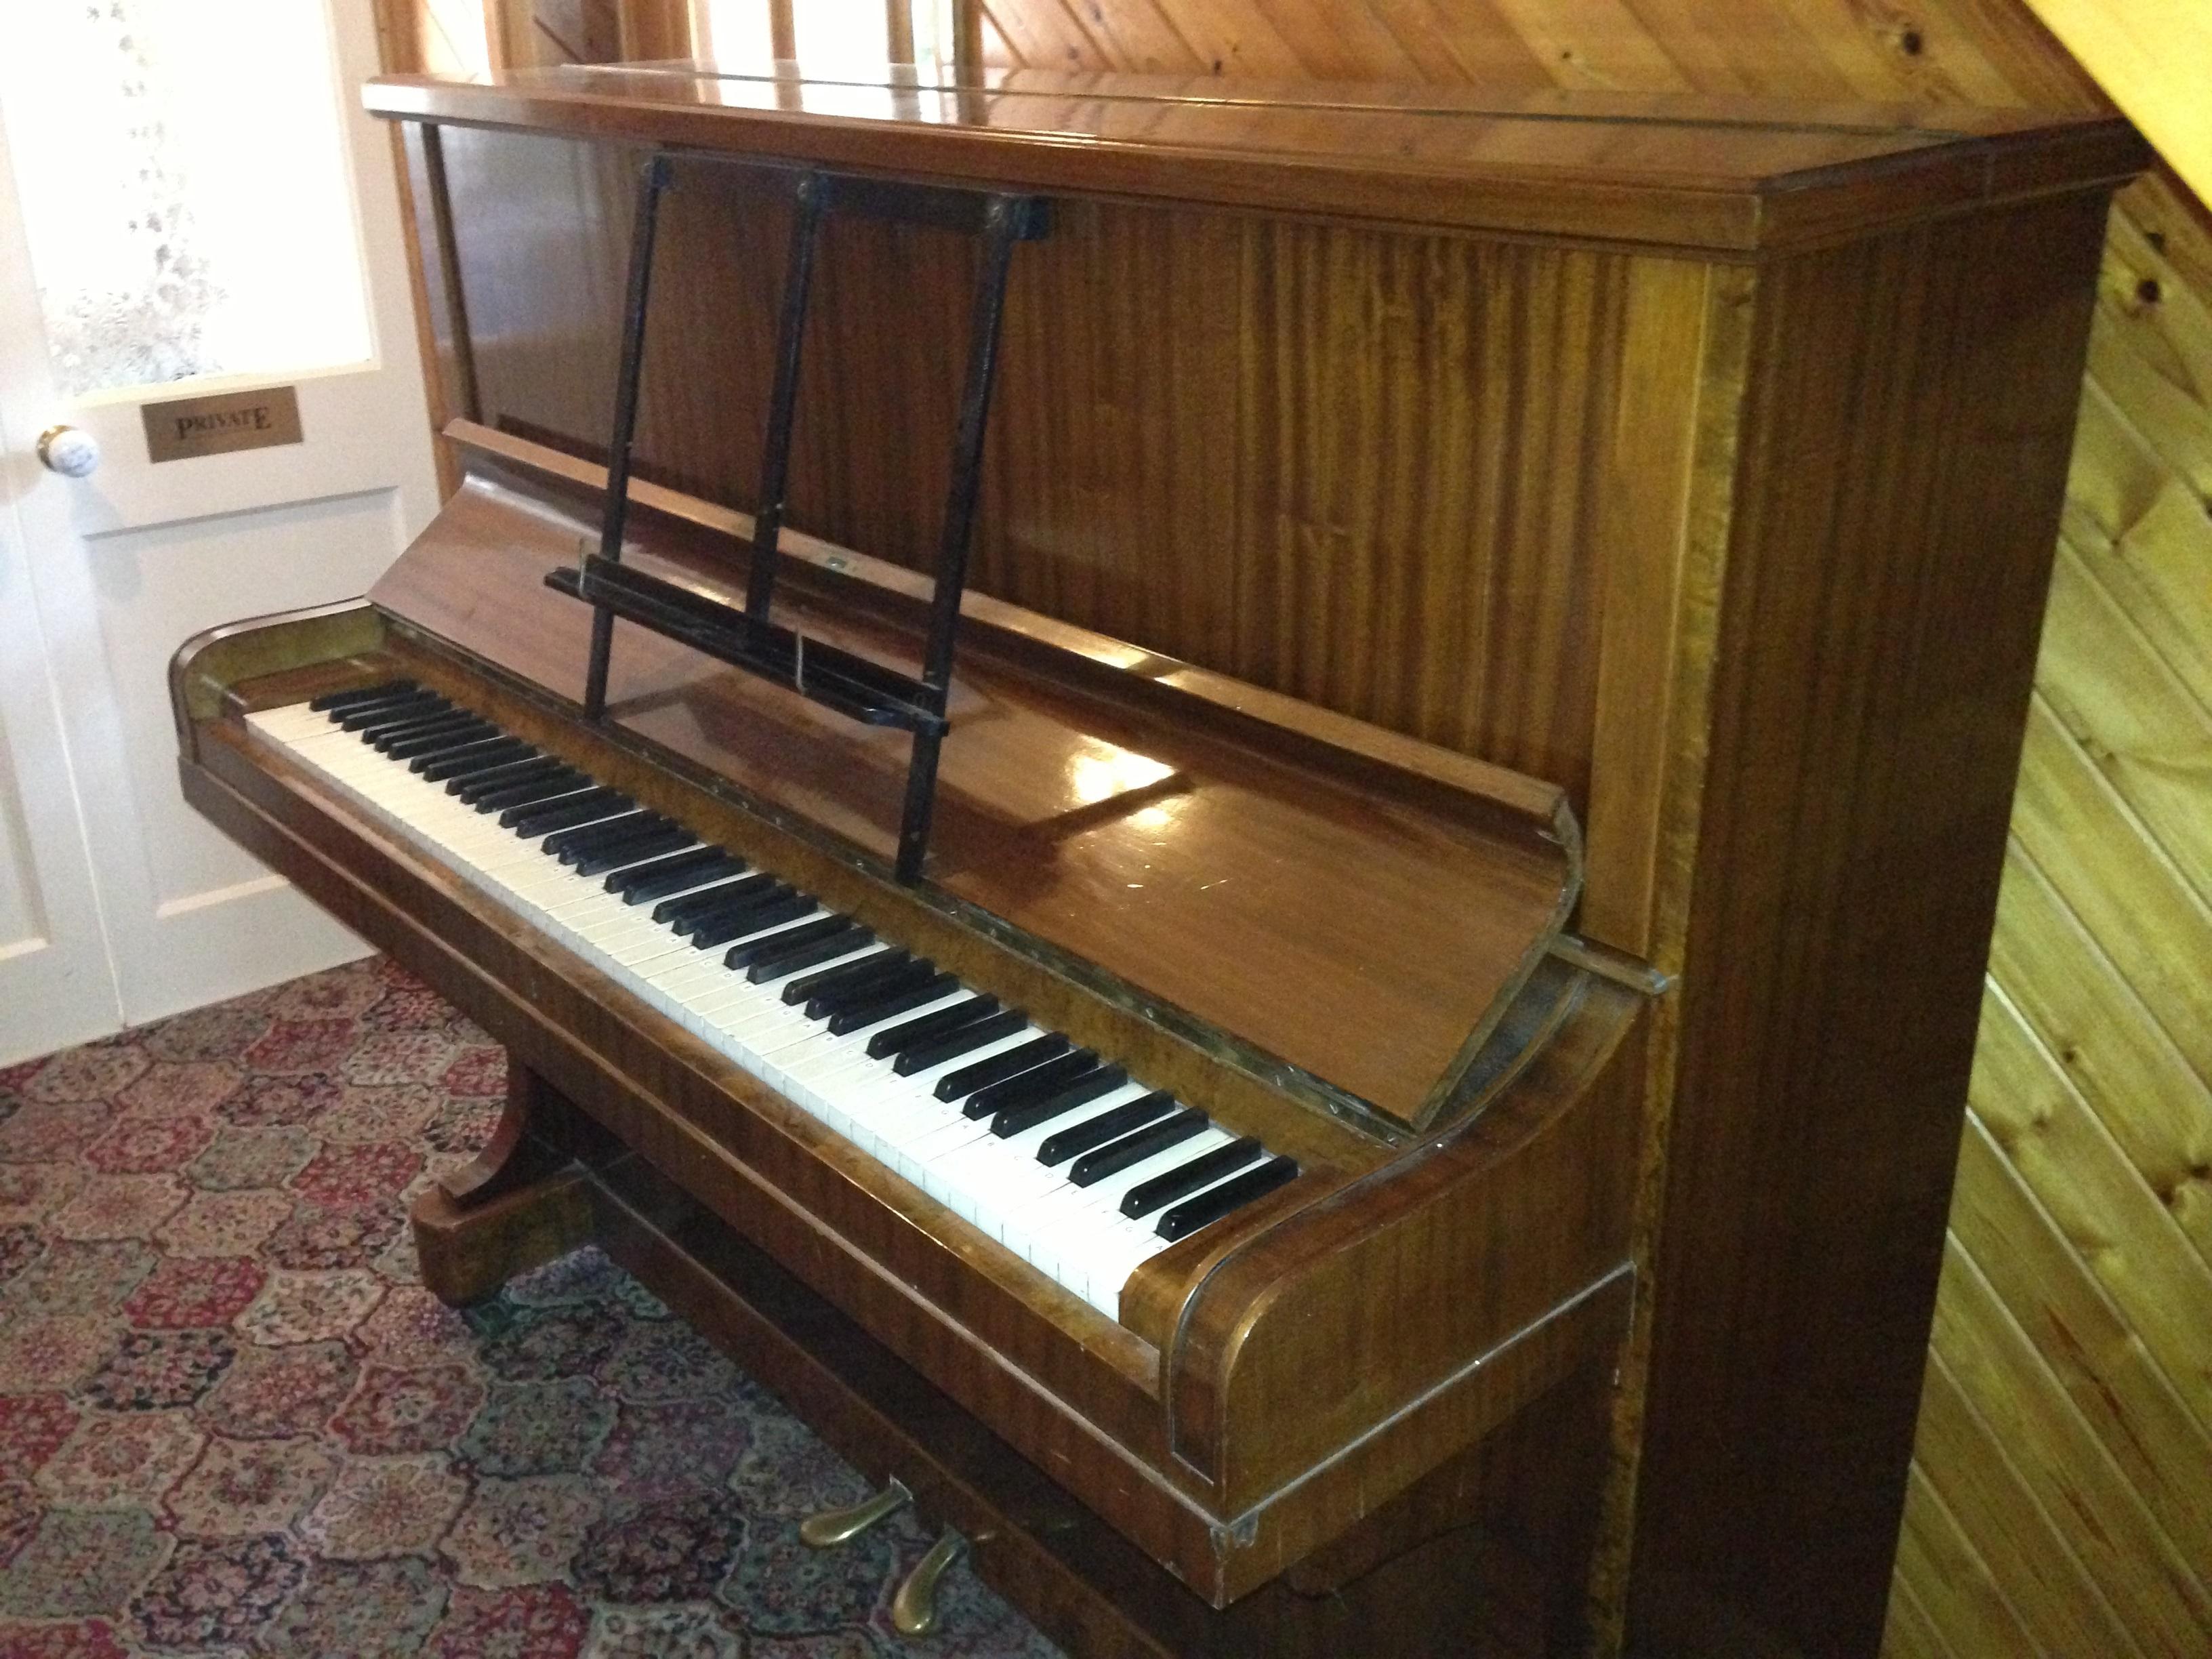 Unknown F Dorner & Sohn Upright piano for sale in Riccall, York